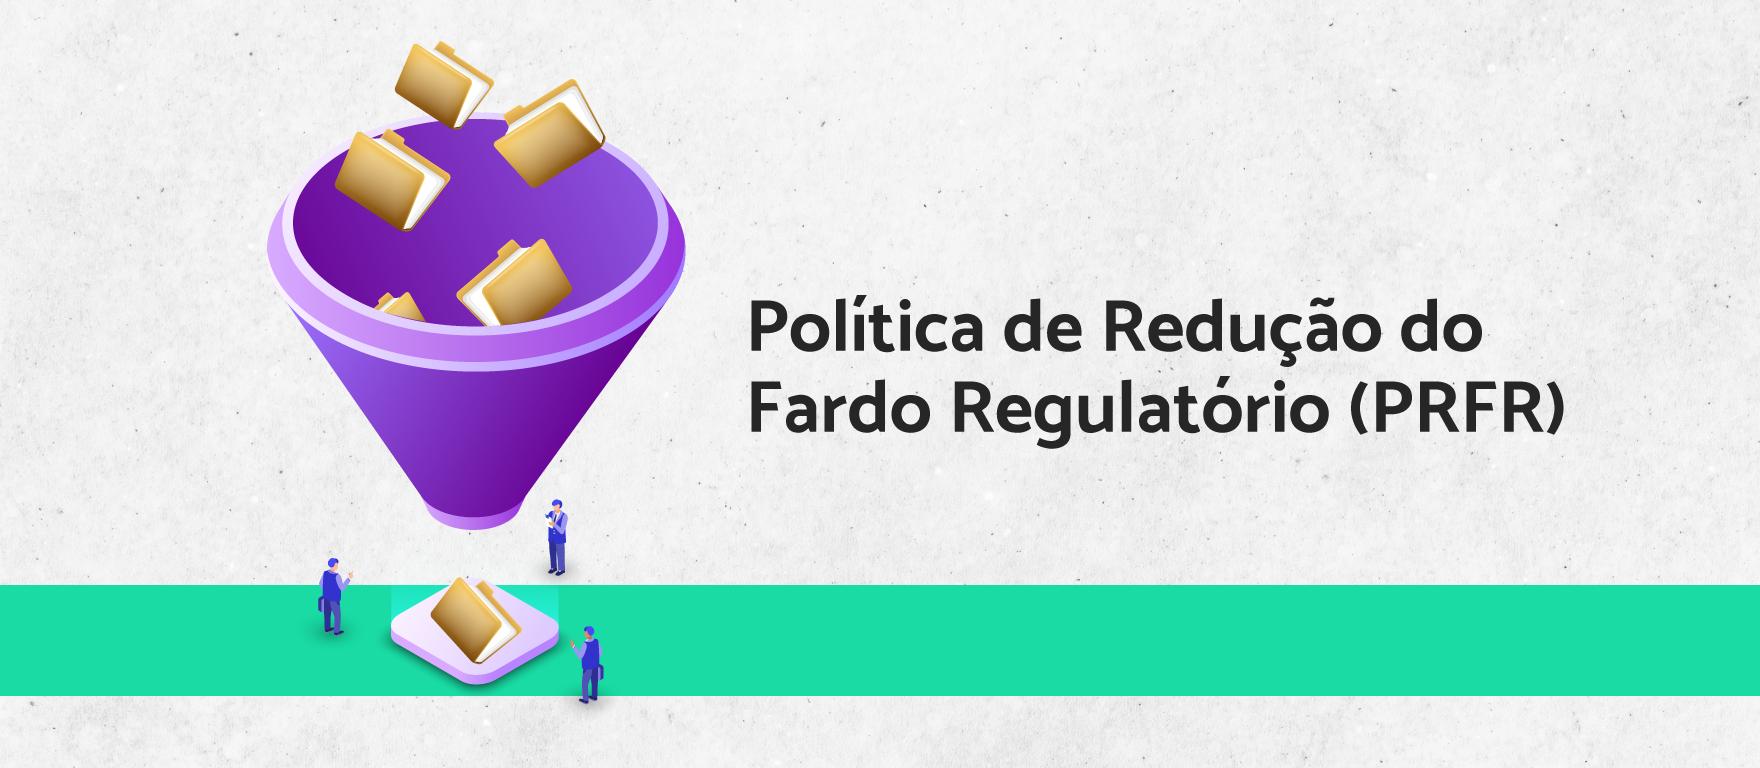 http://governanca.antt.gov.br/PublishingImages/Lists/Noticia/PRFRsite.png